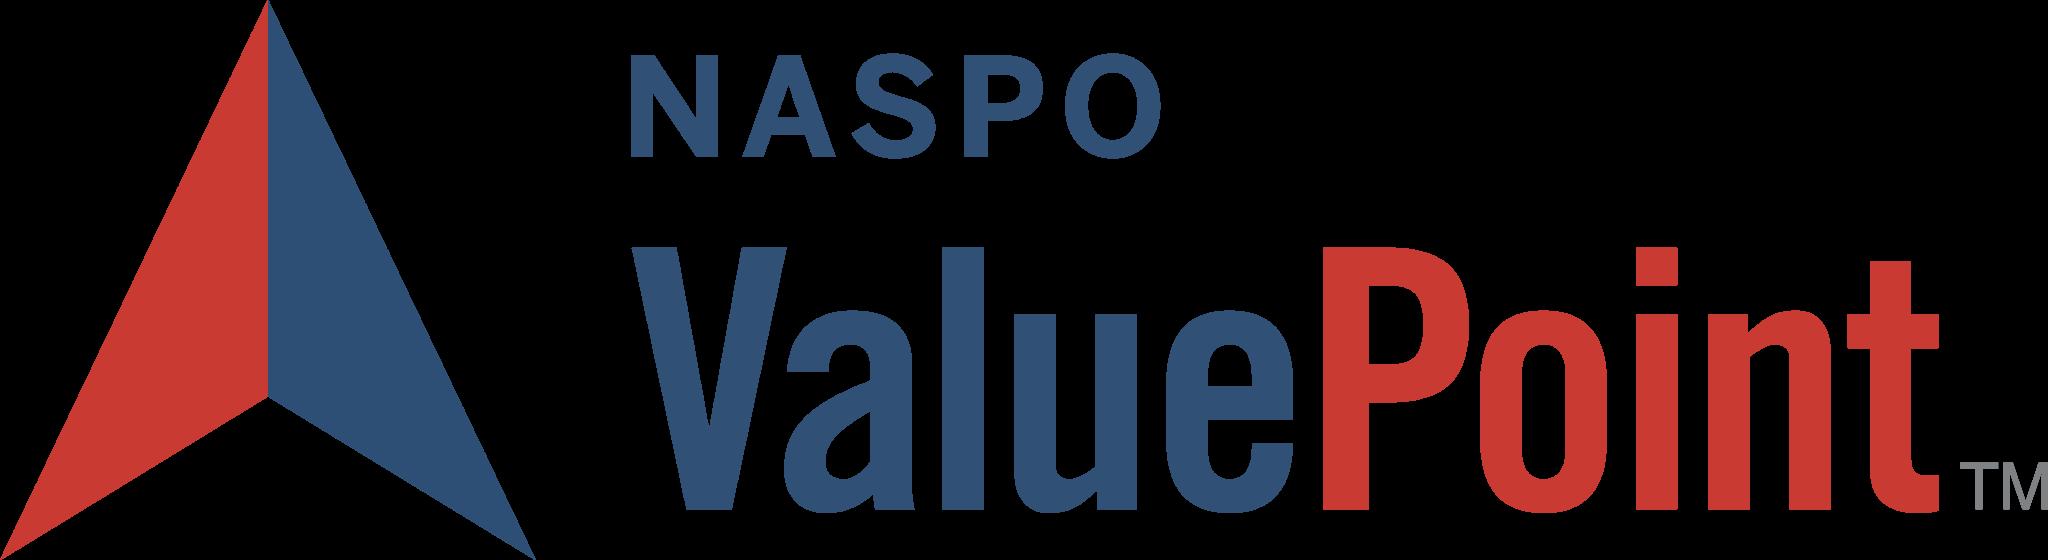 AchieveIt Naspo ValuePoint